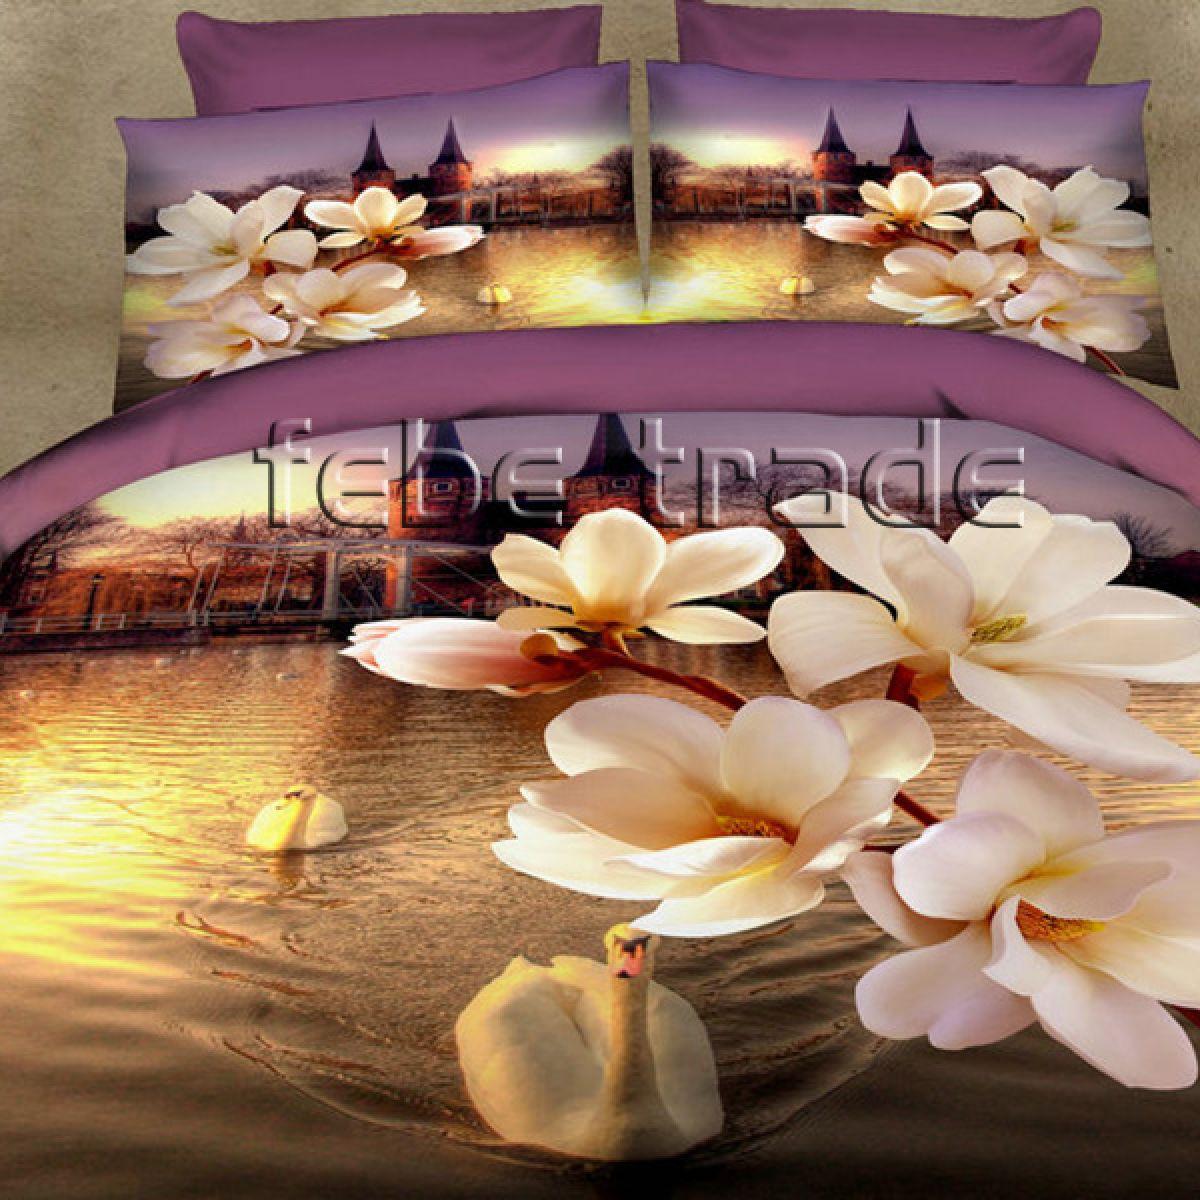 3D Beddings - Cotton World - FSB-408 - 180x200 cm - 4 pcs